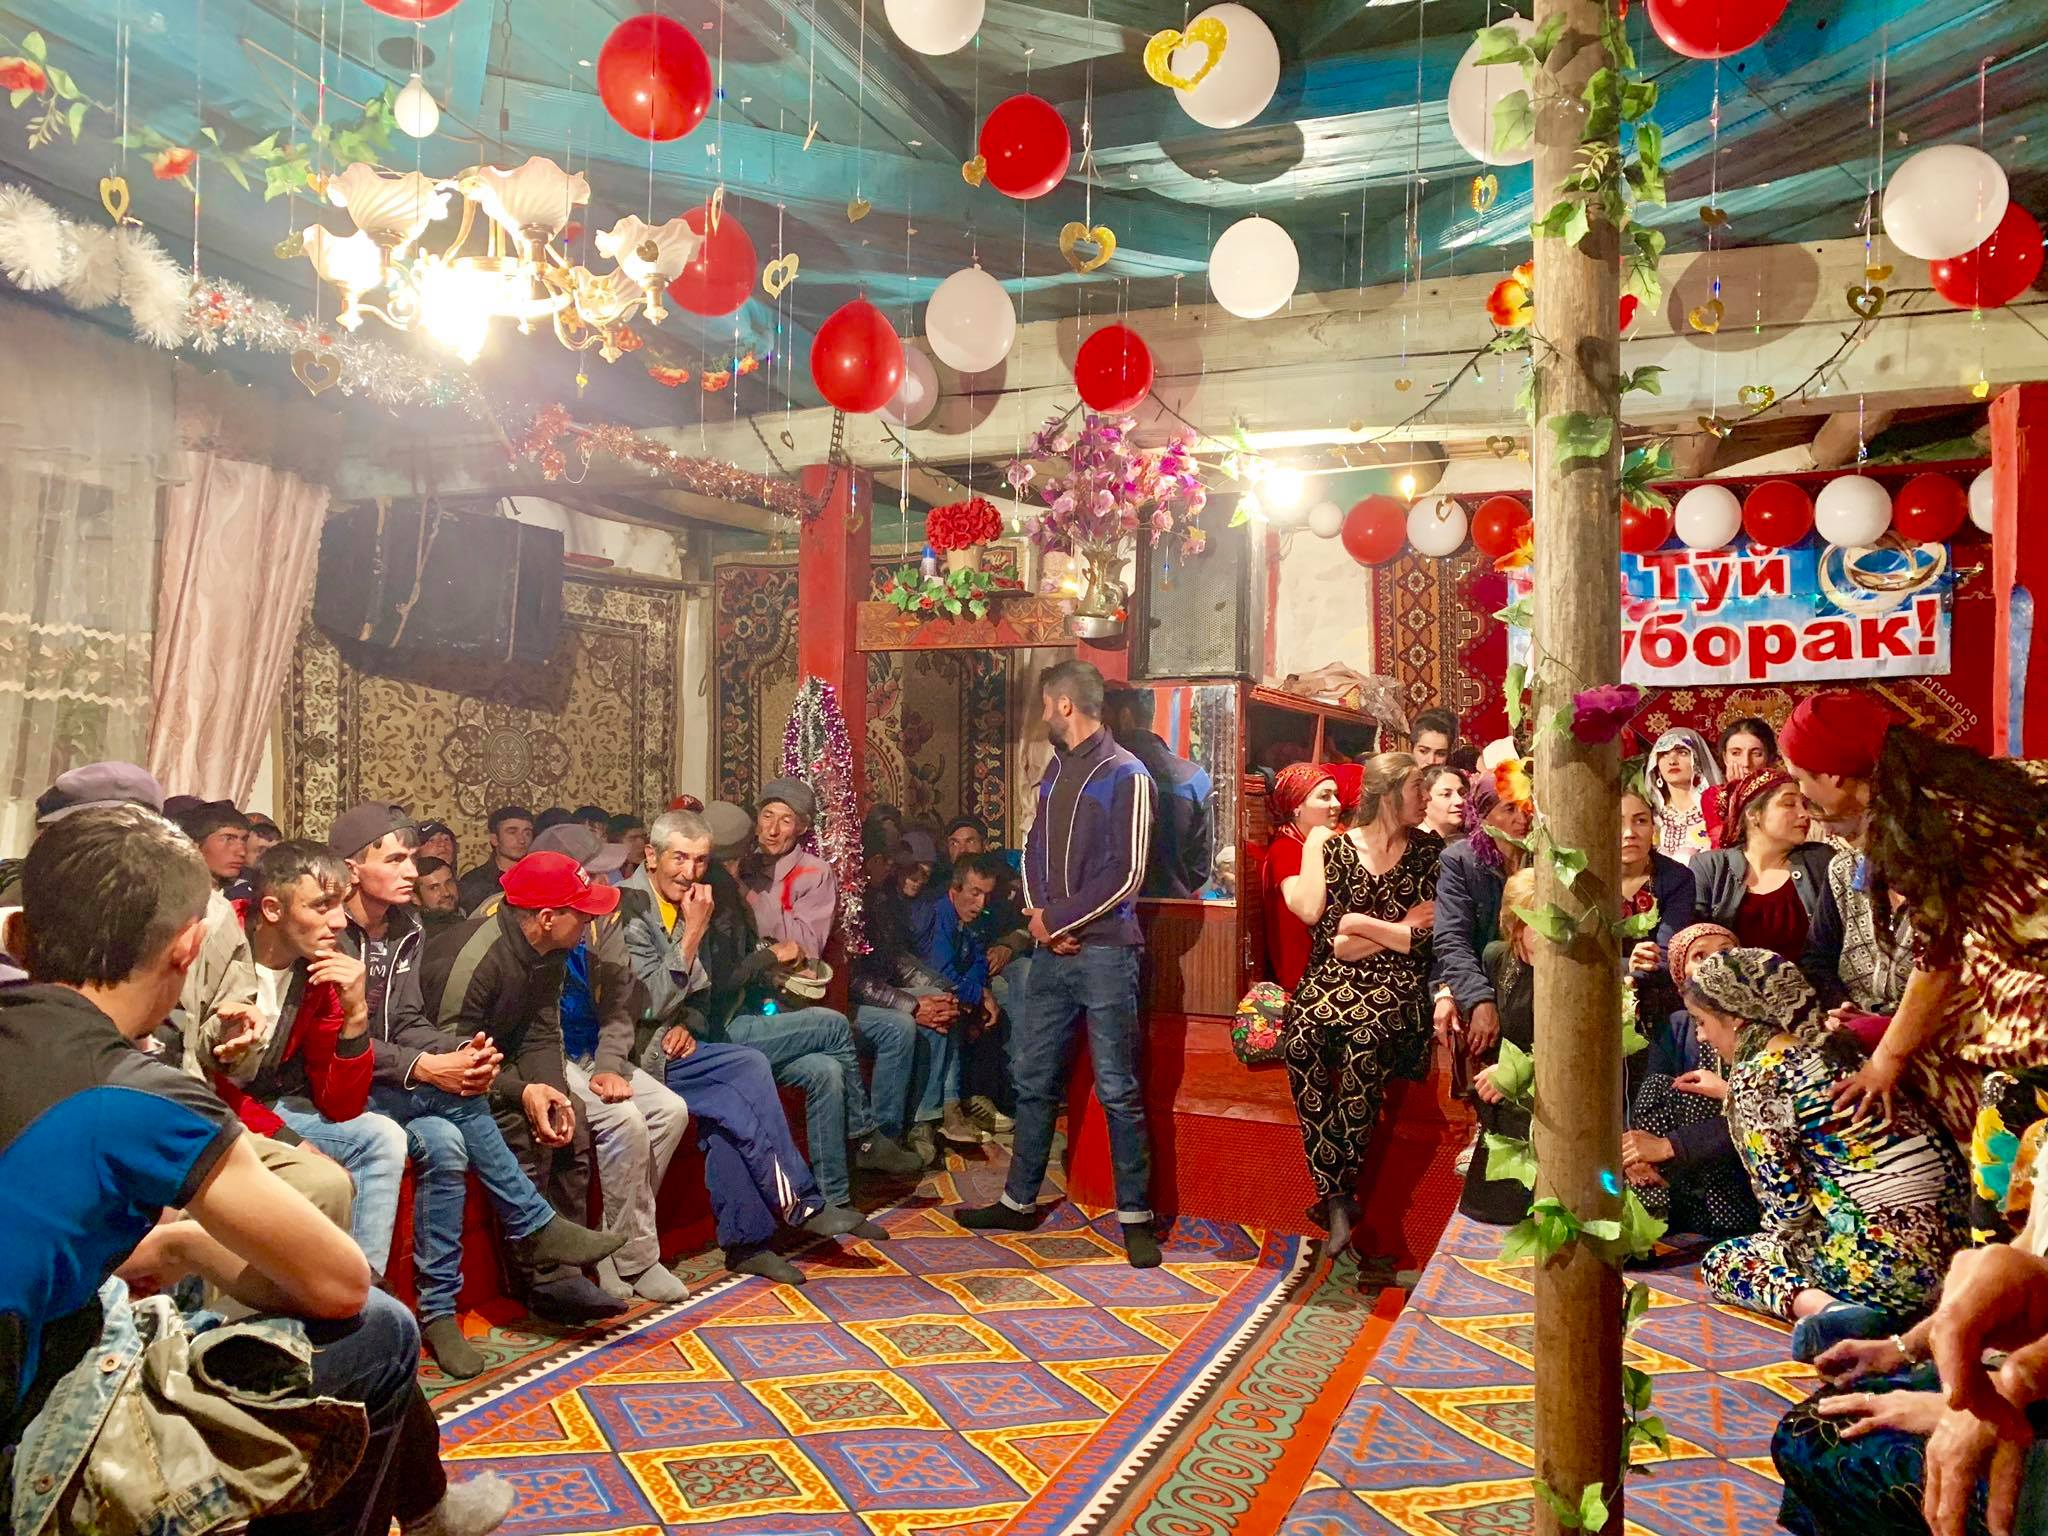 Kach Solo Travels in 2019 Experiencing a Traditional Wakhan Wedding in Tajikistan3.jpg